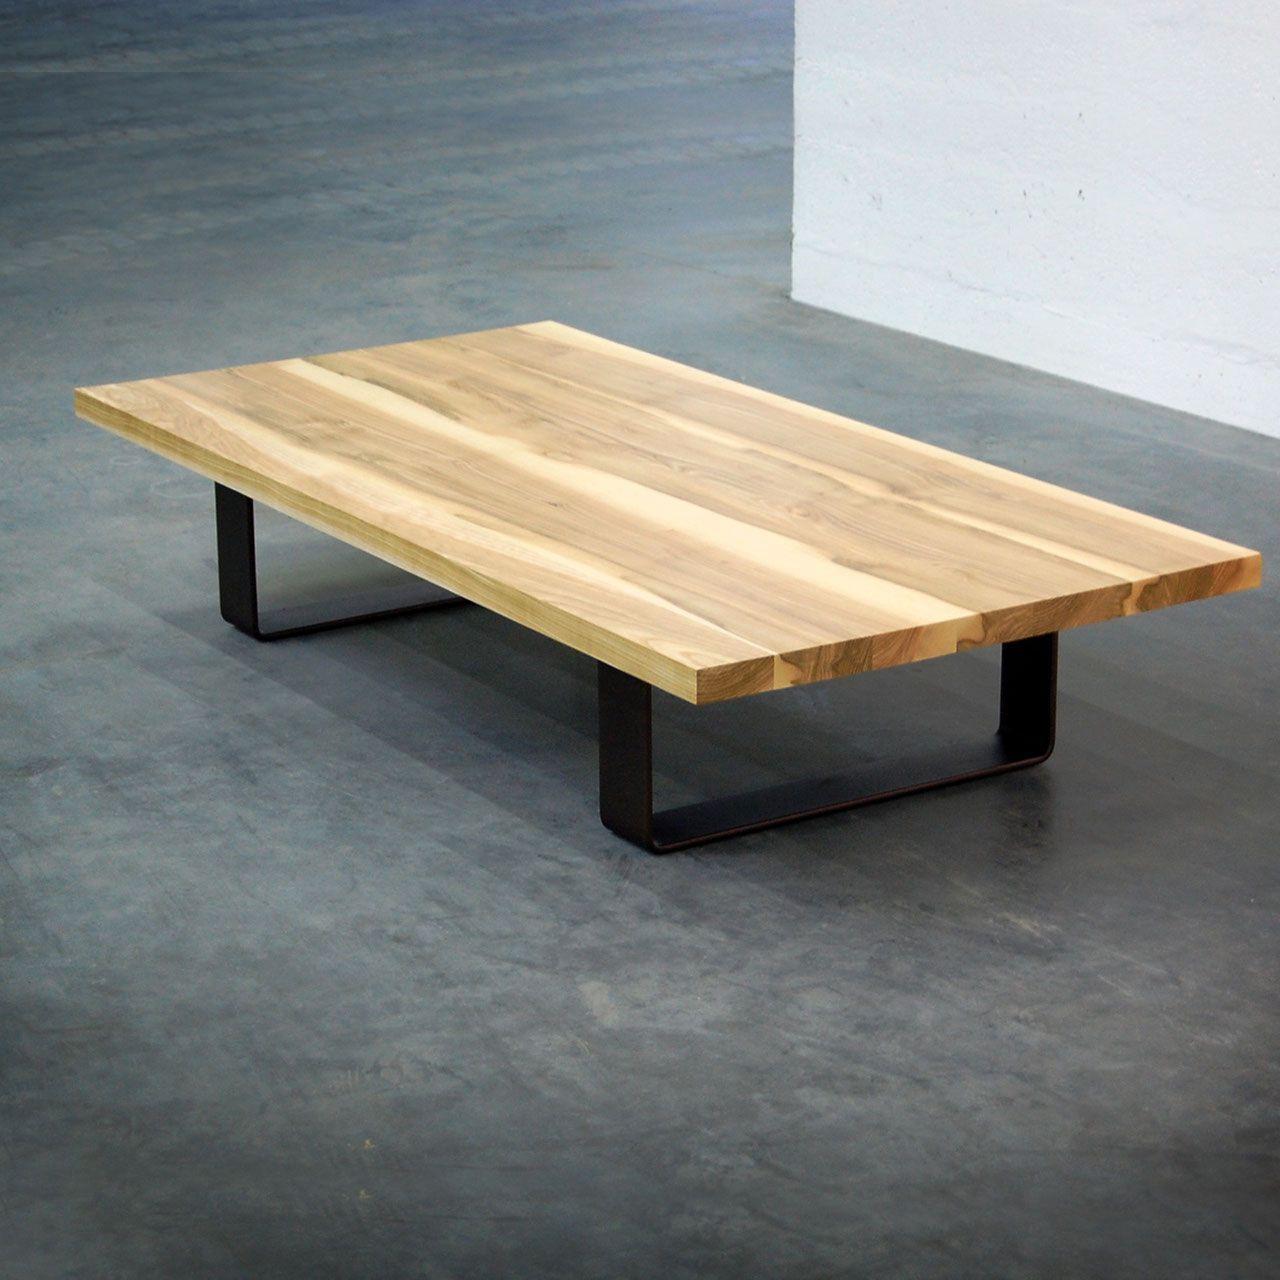 Table Basse Ruban Metal Et Bois Massif Fabrication Artisanale Table Basse Table Basse Bois Massif Table Basse Plateau